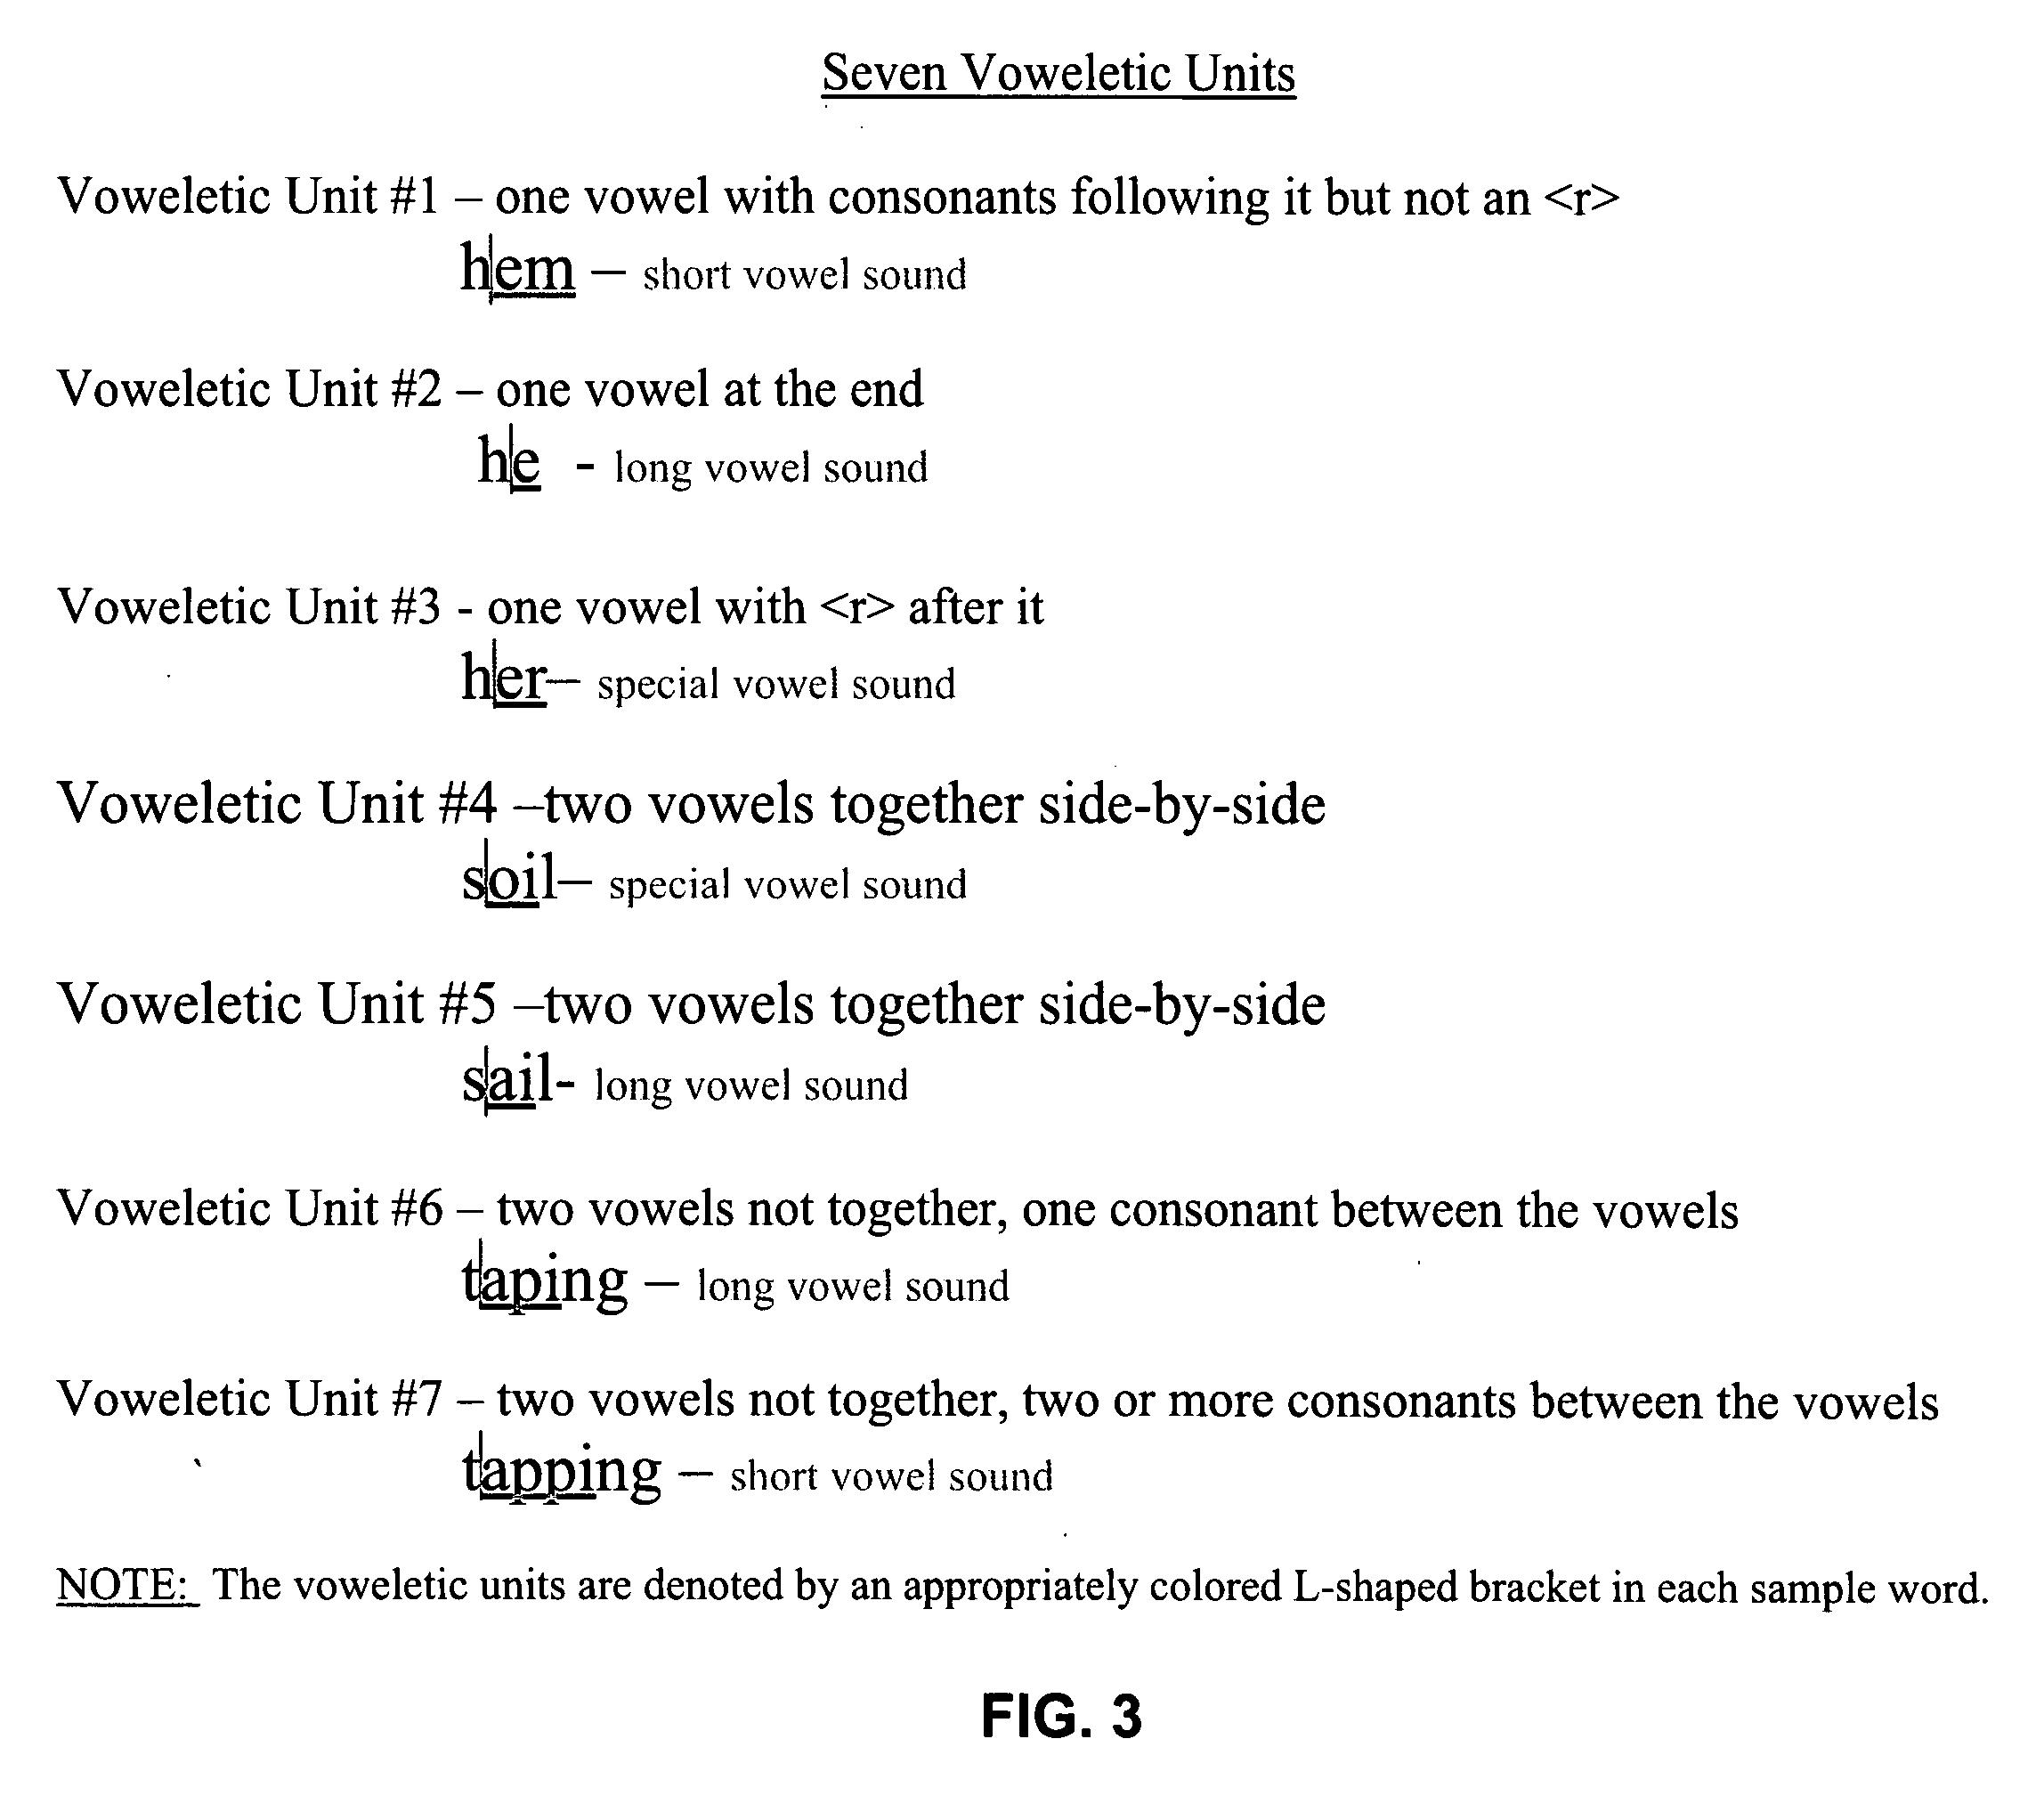 Long vowel coloring sheet - Long Vowel Coloring Sheet Patent Drawing